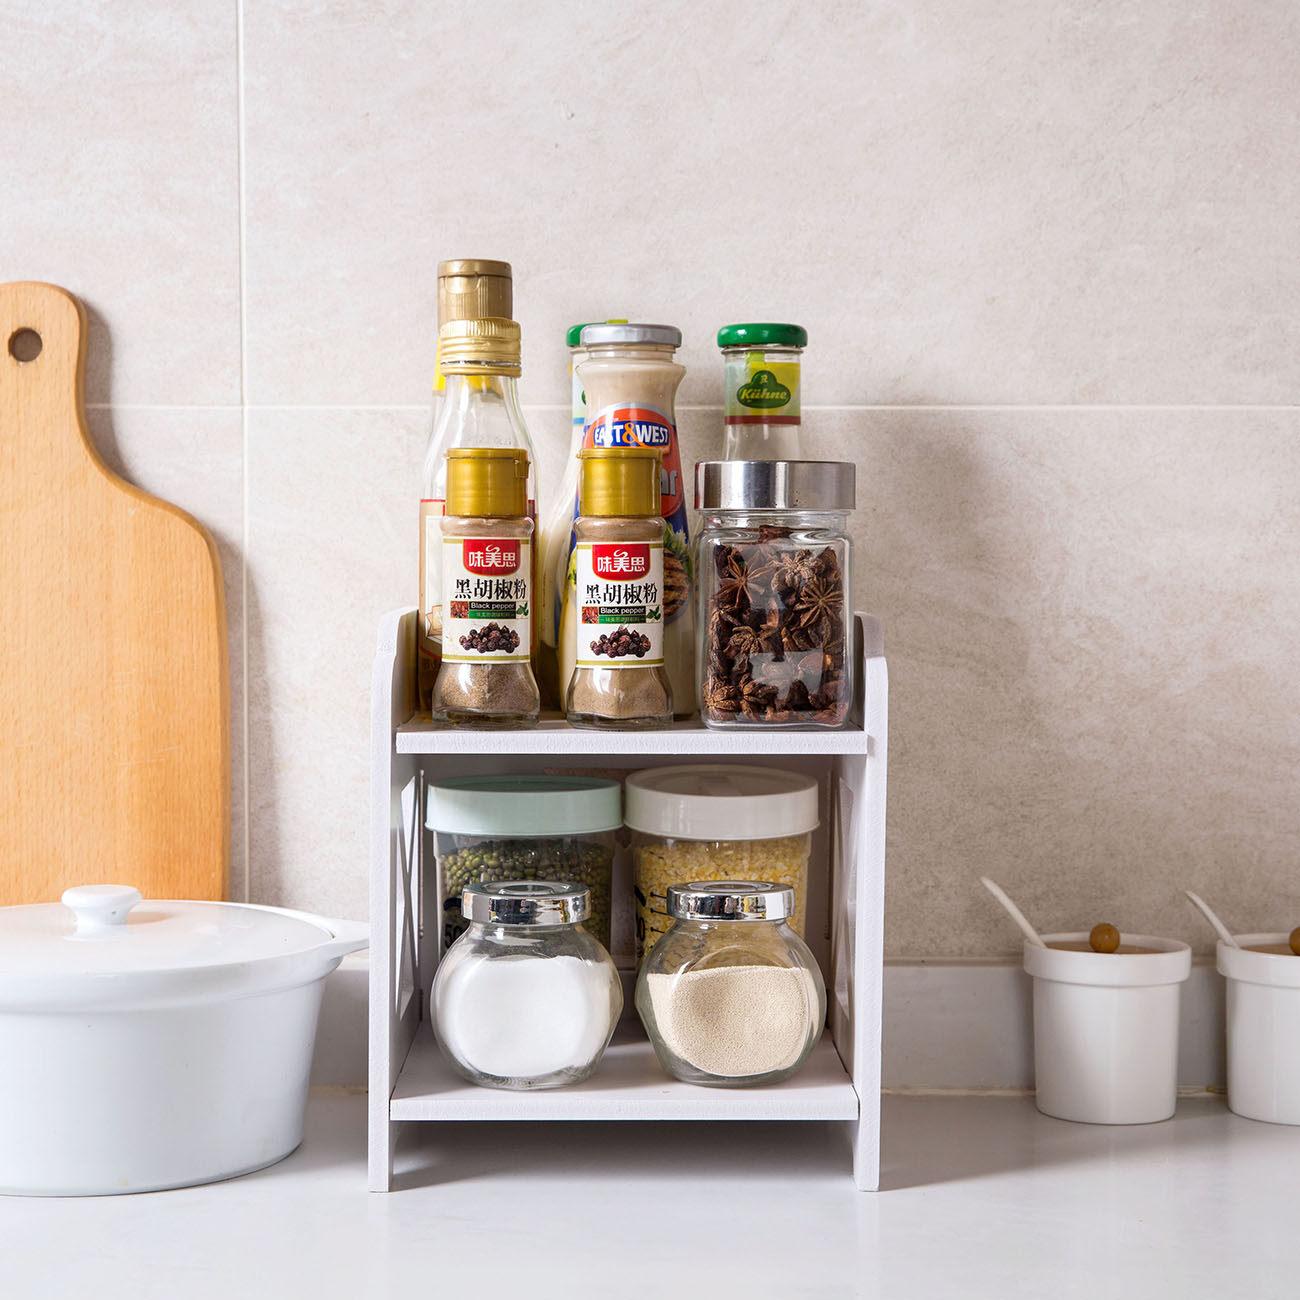 Wood Desktop Shelf Bathroom Storage